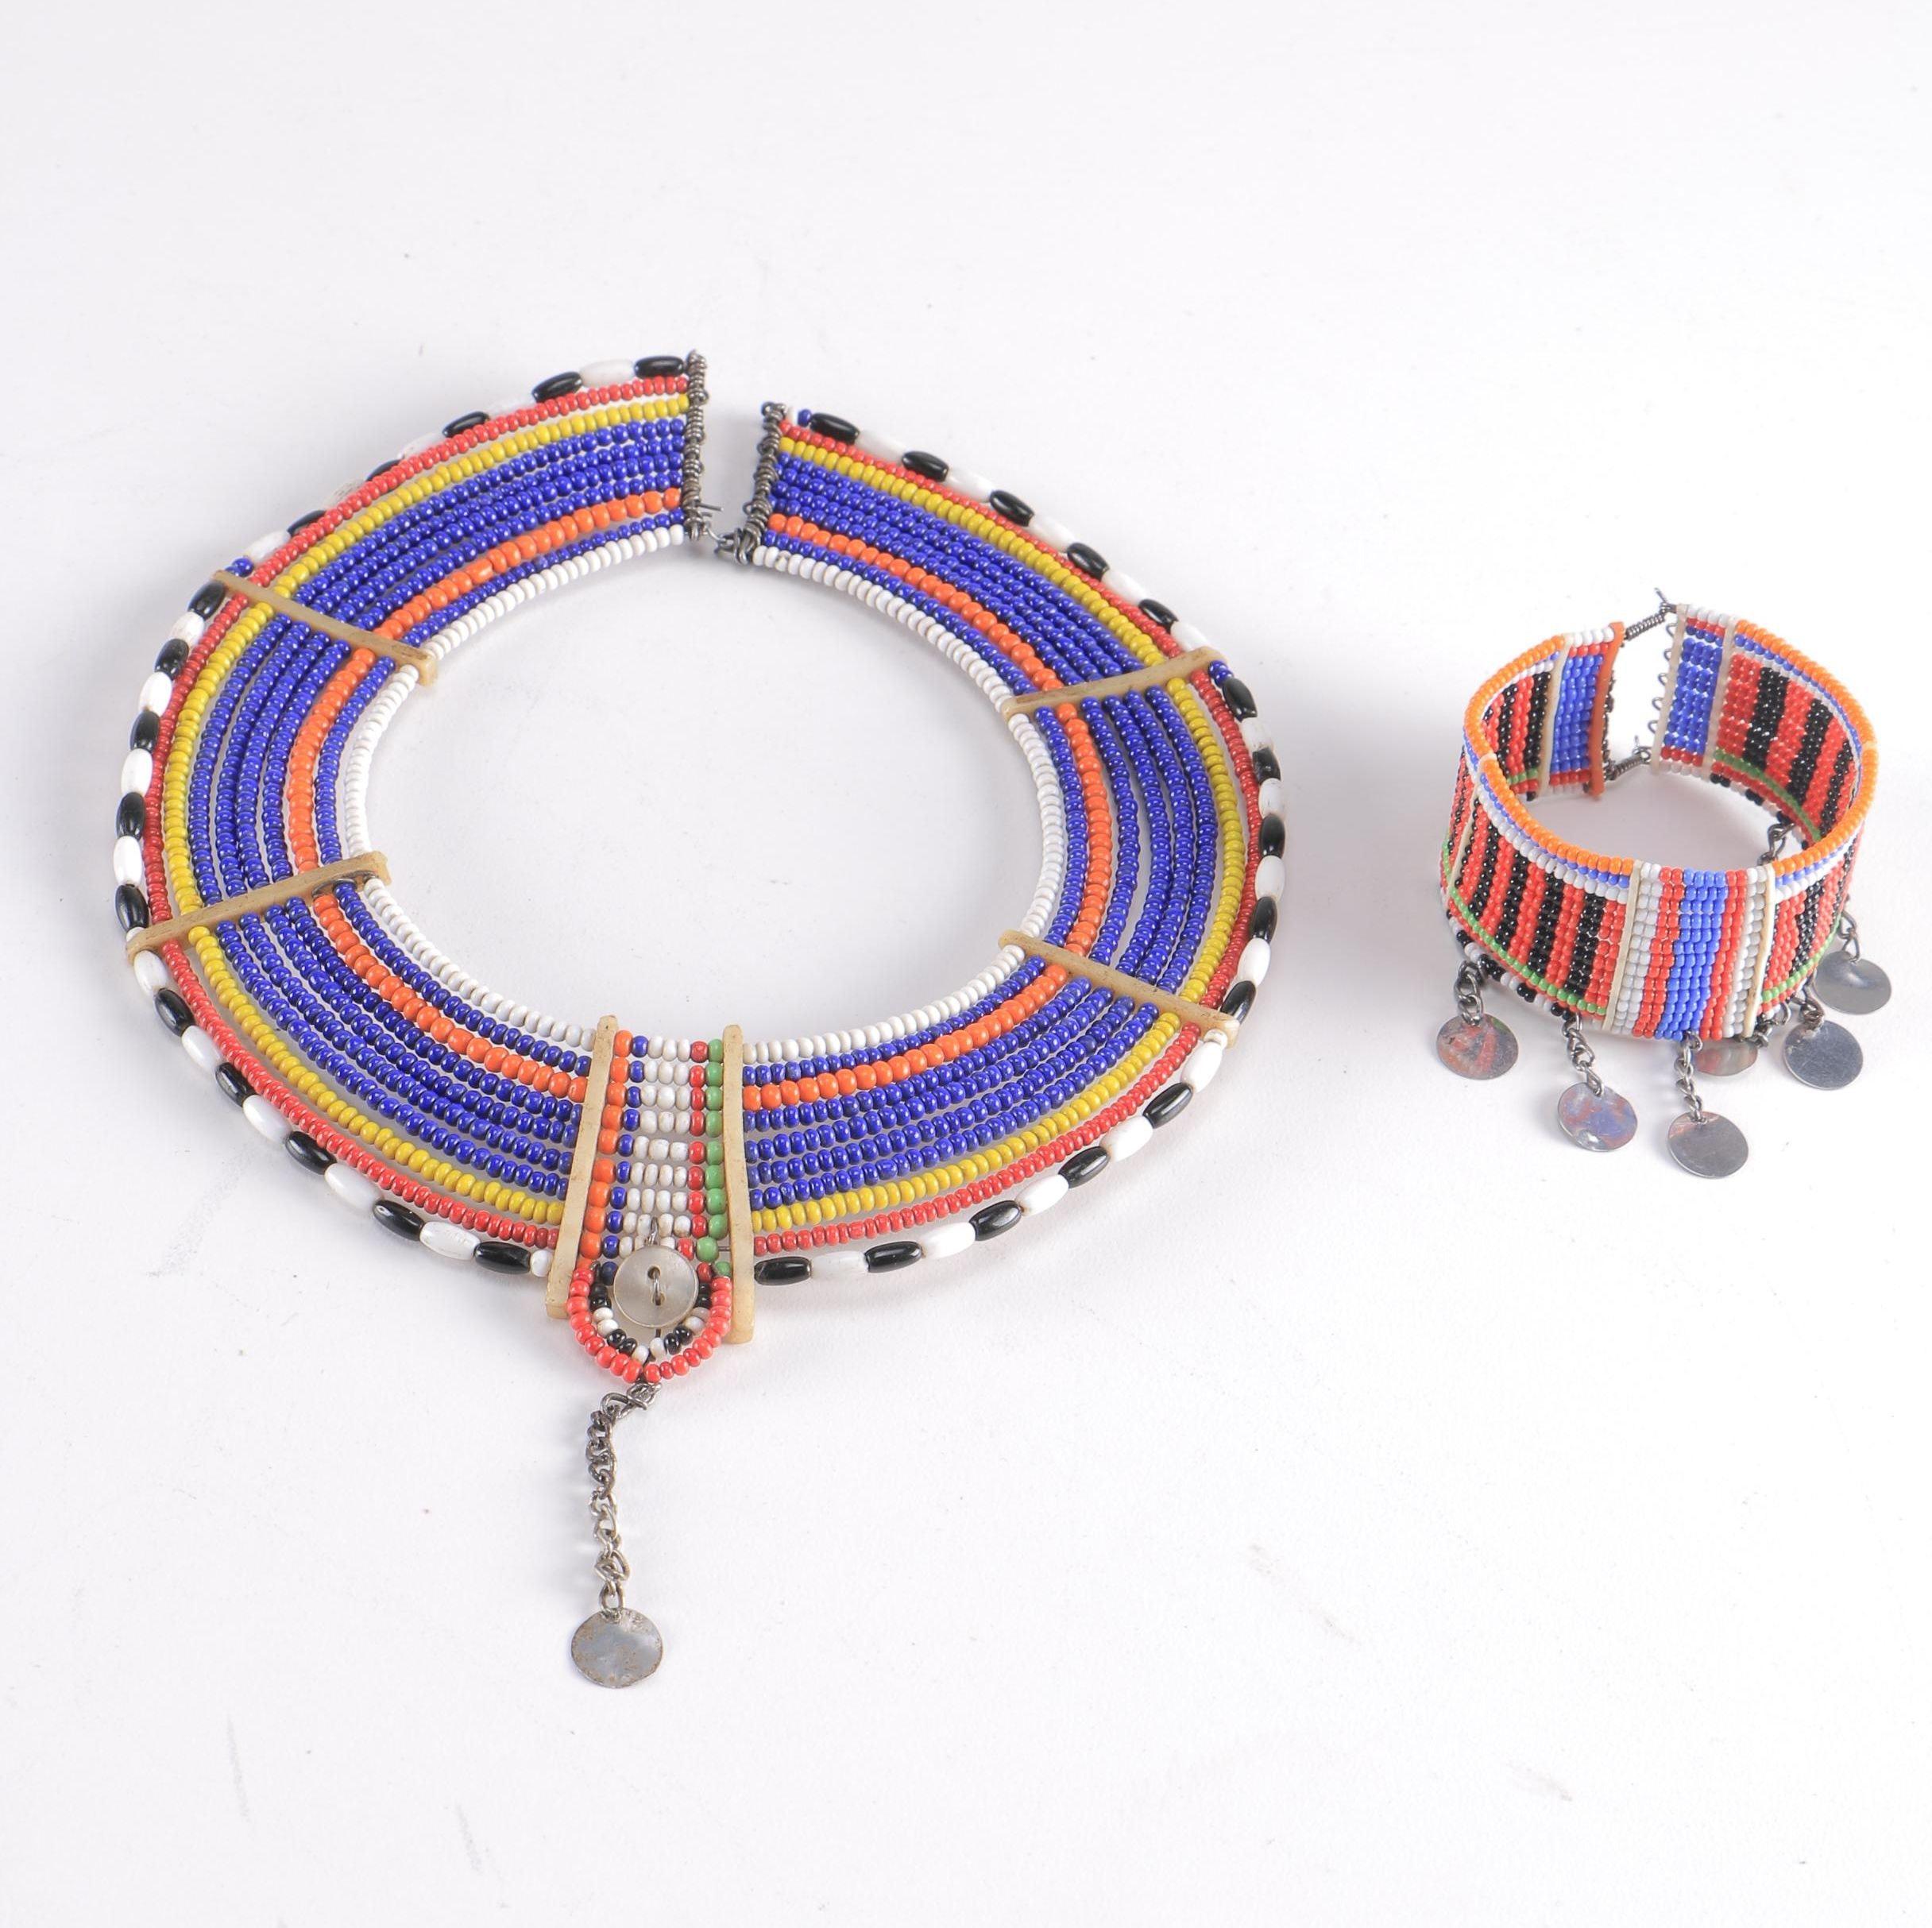 Maasai Mara Beaded Collar Necklace and Cuff Set